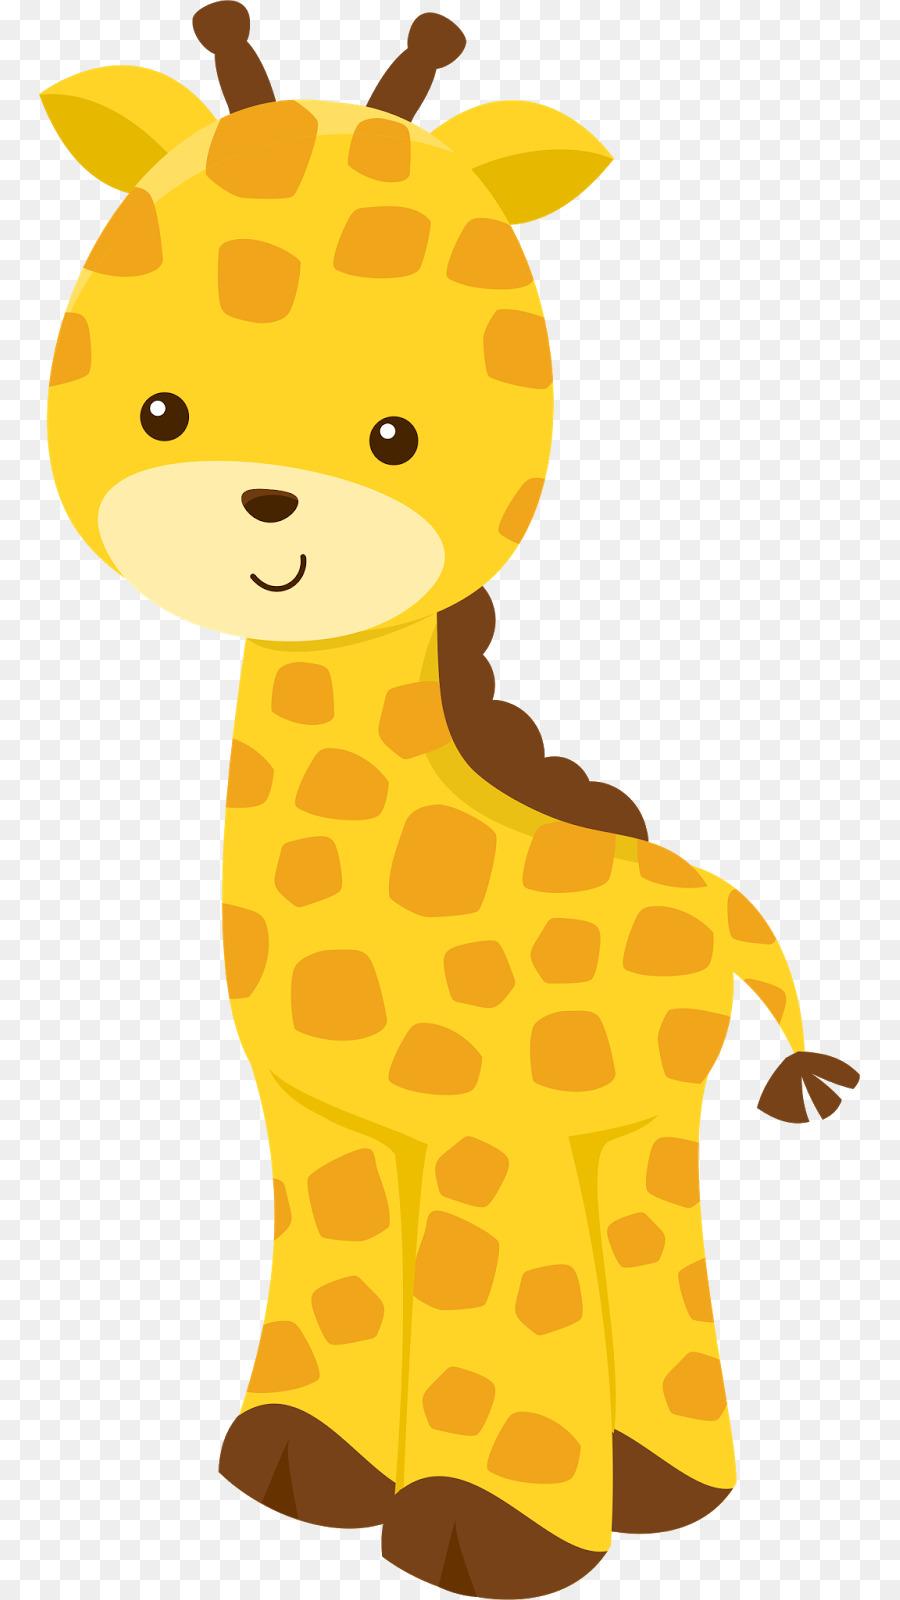 Lion clipart giraffe. Cartoon animal transparent